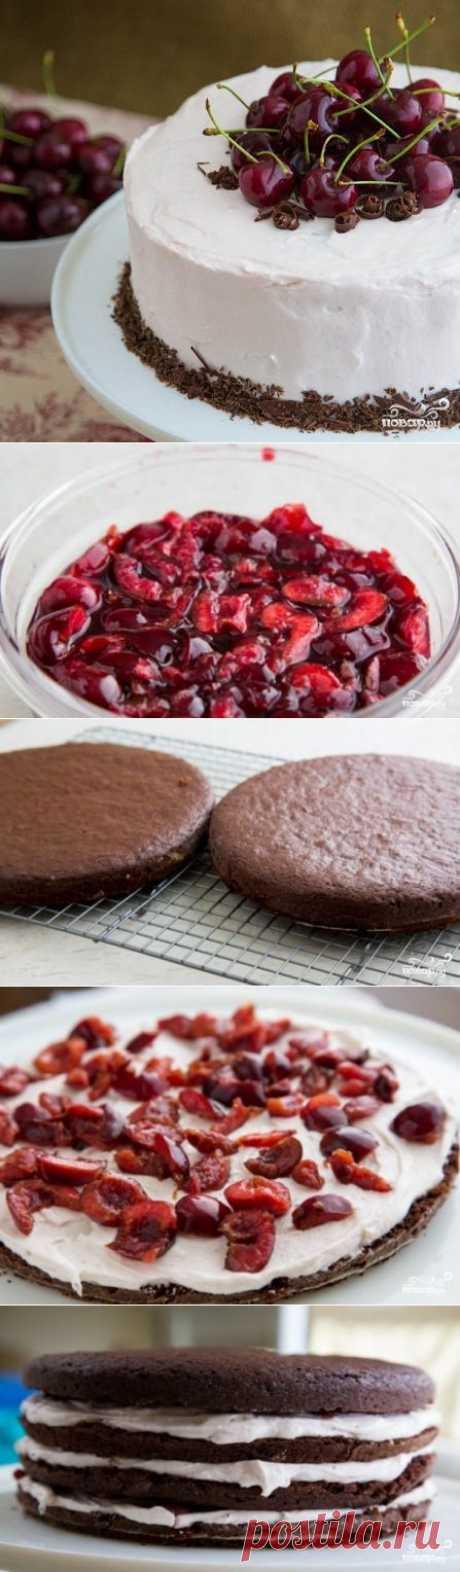 "Торт ""Пьяная вишня"" - пошаговый кулинарный рецепт на Повар.ру"